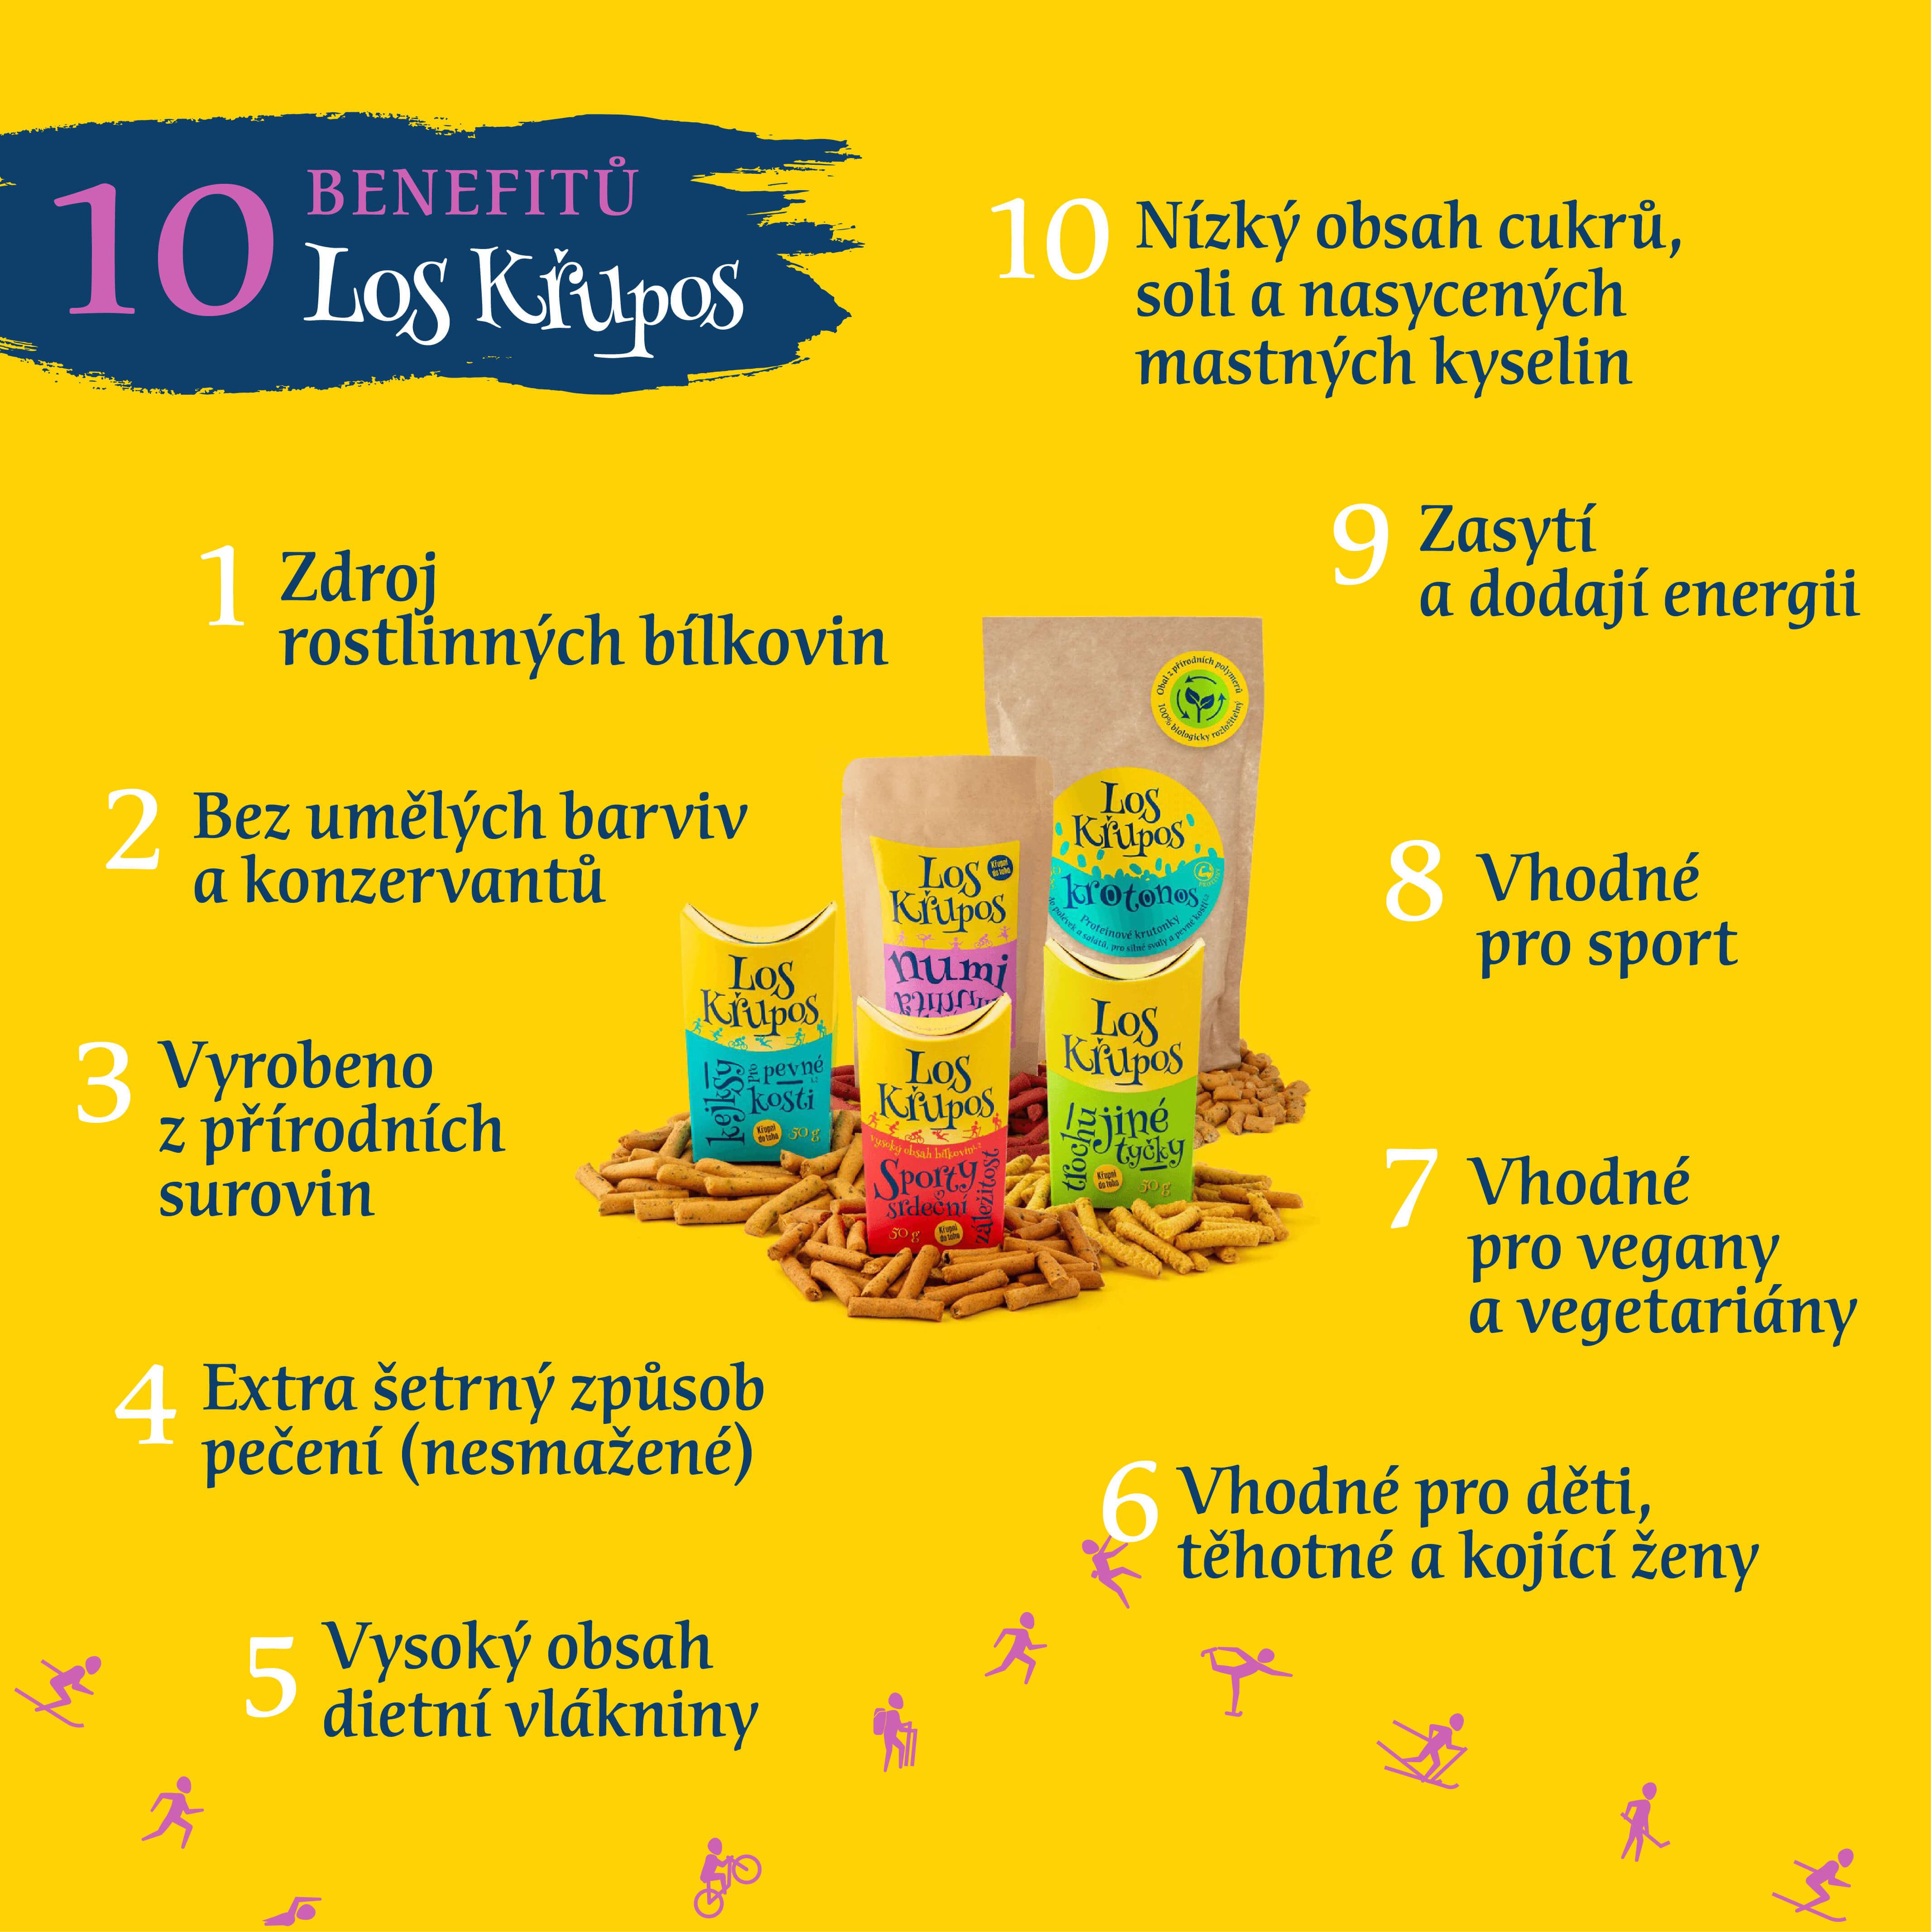 los-krupos-degust-10-benefitu